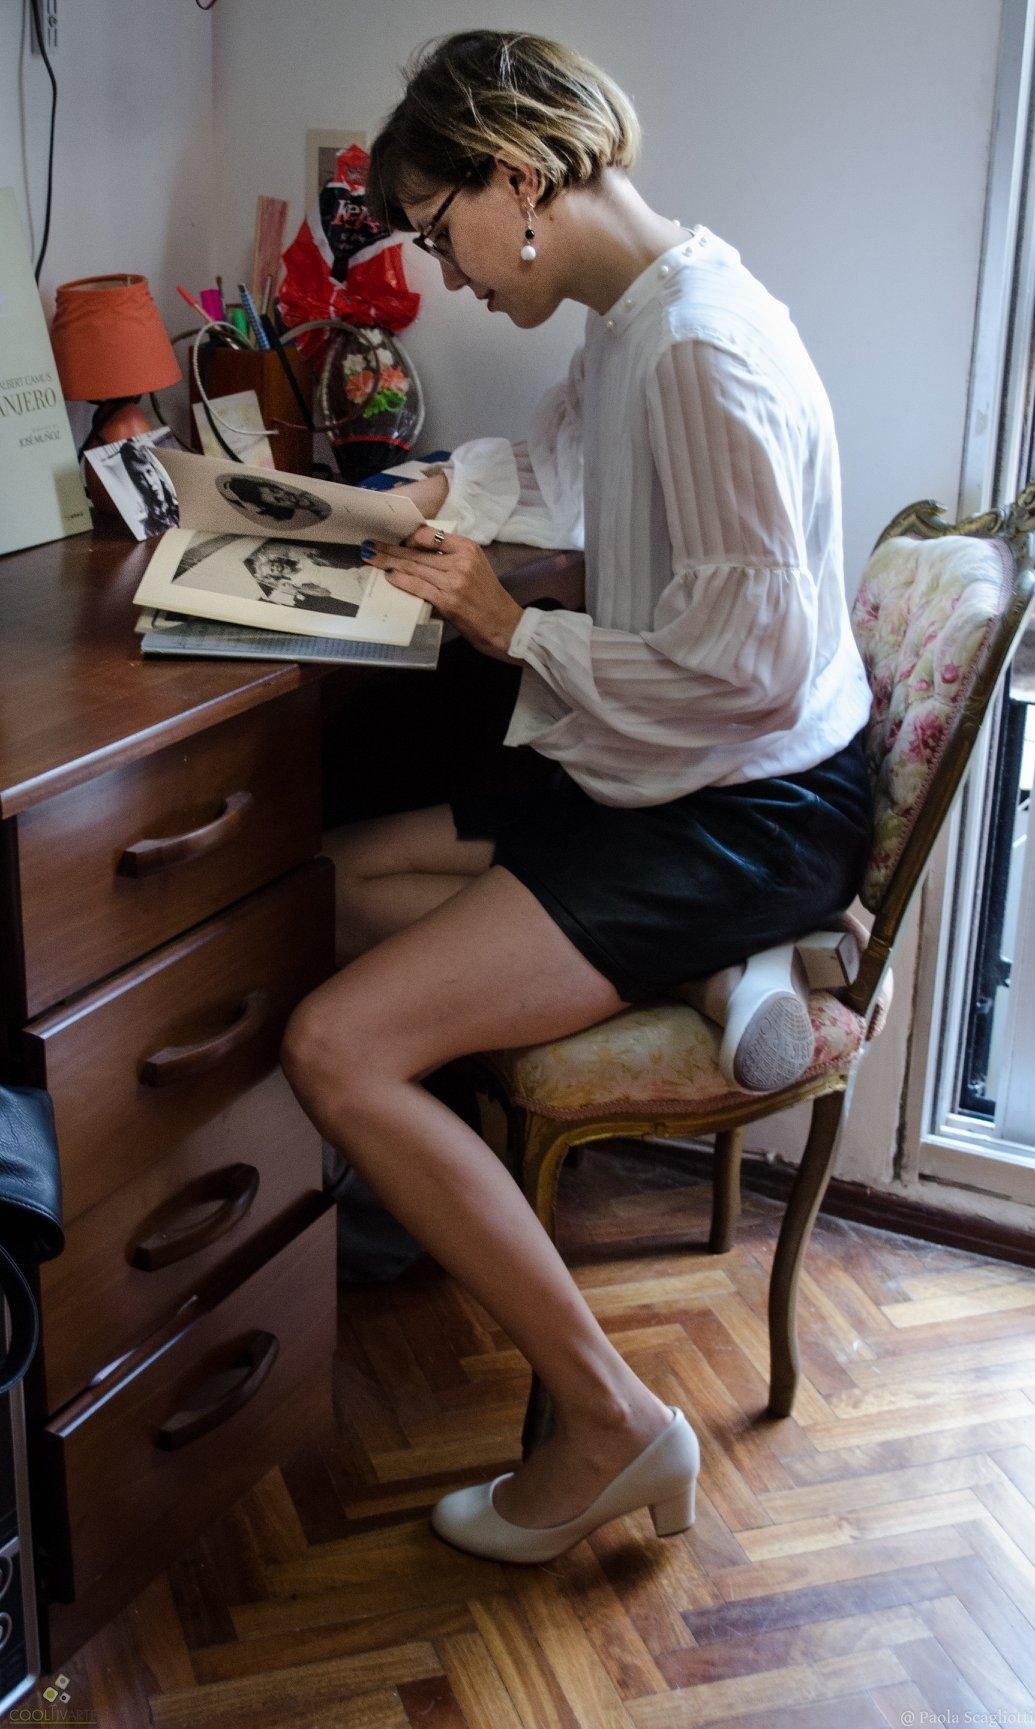 Fotorreportaje a Romina Serrano - Abril 2018 - Foto Paola Scagliotti www.cooltivarte.com